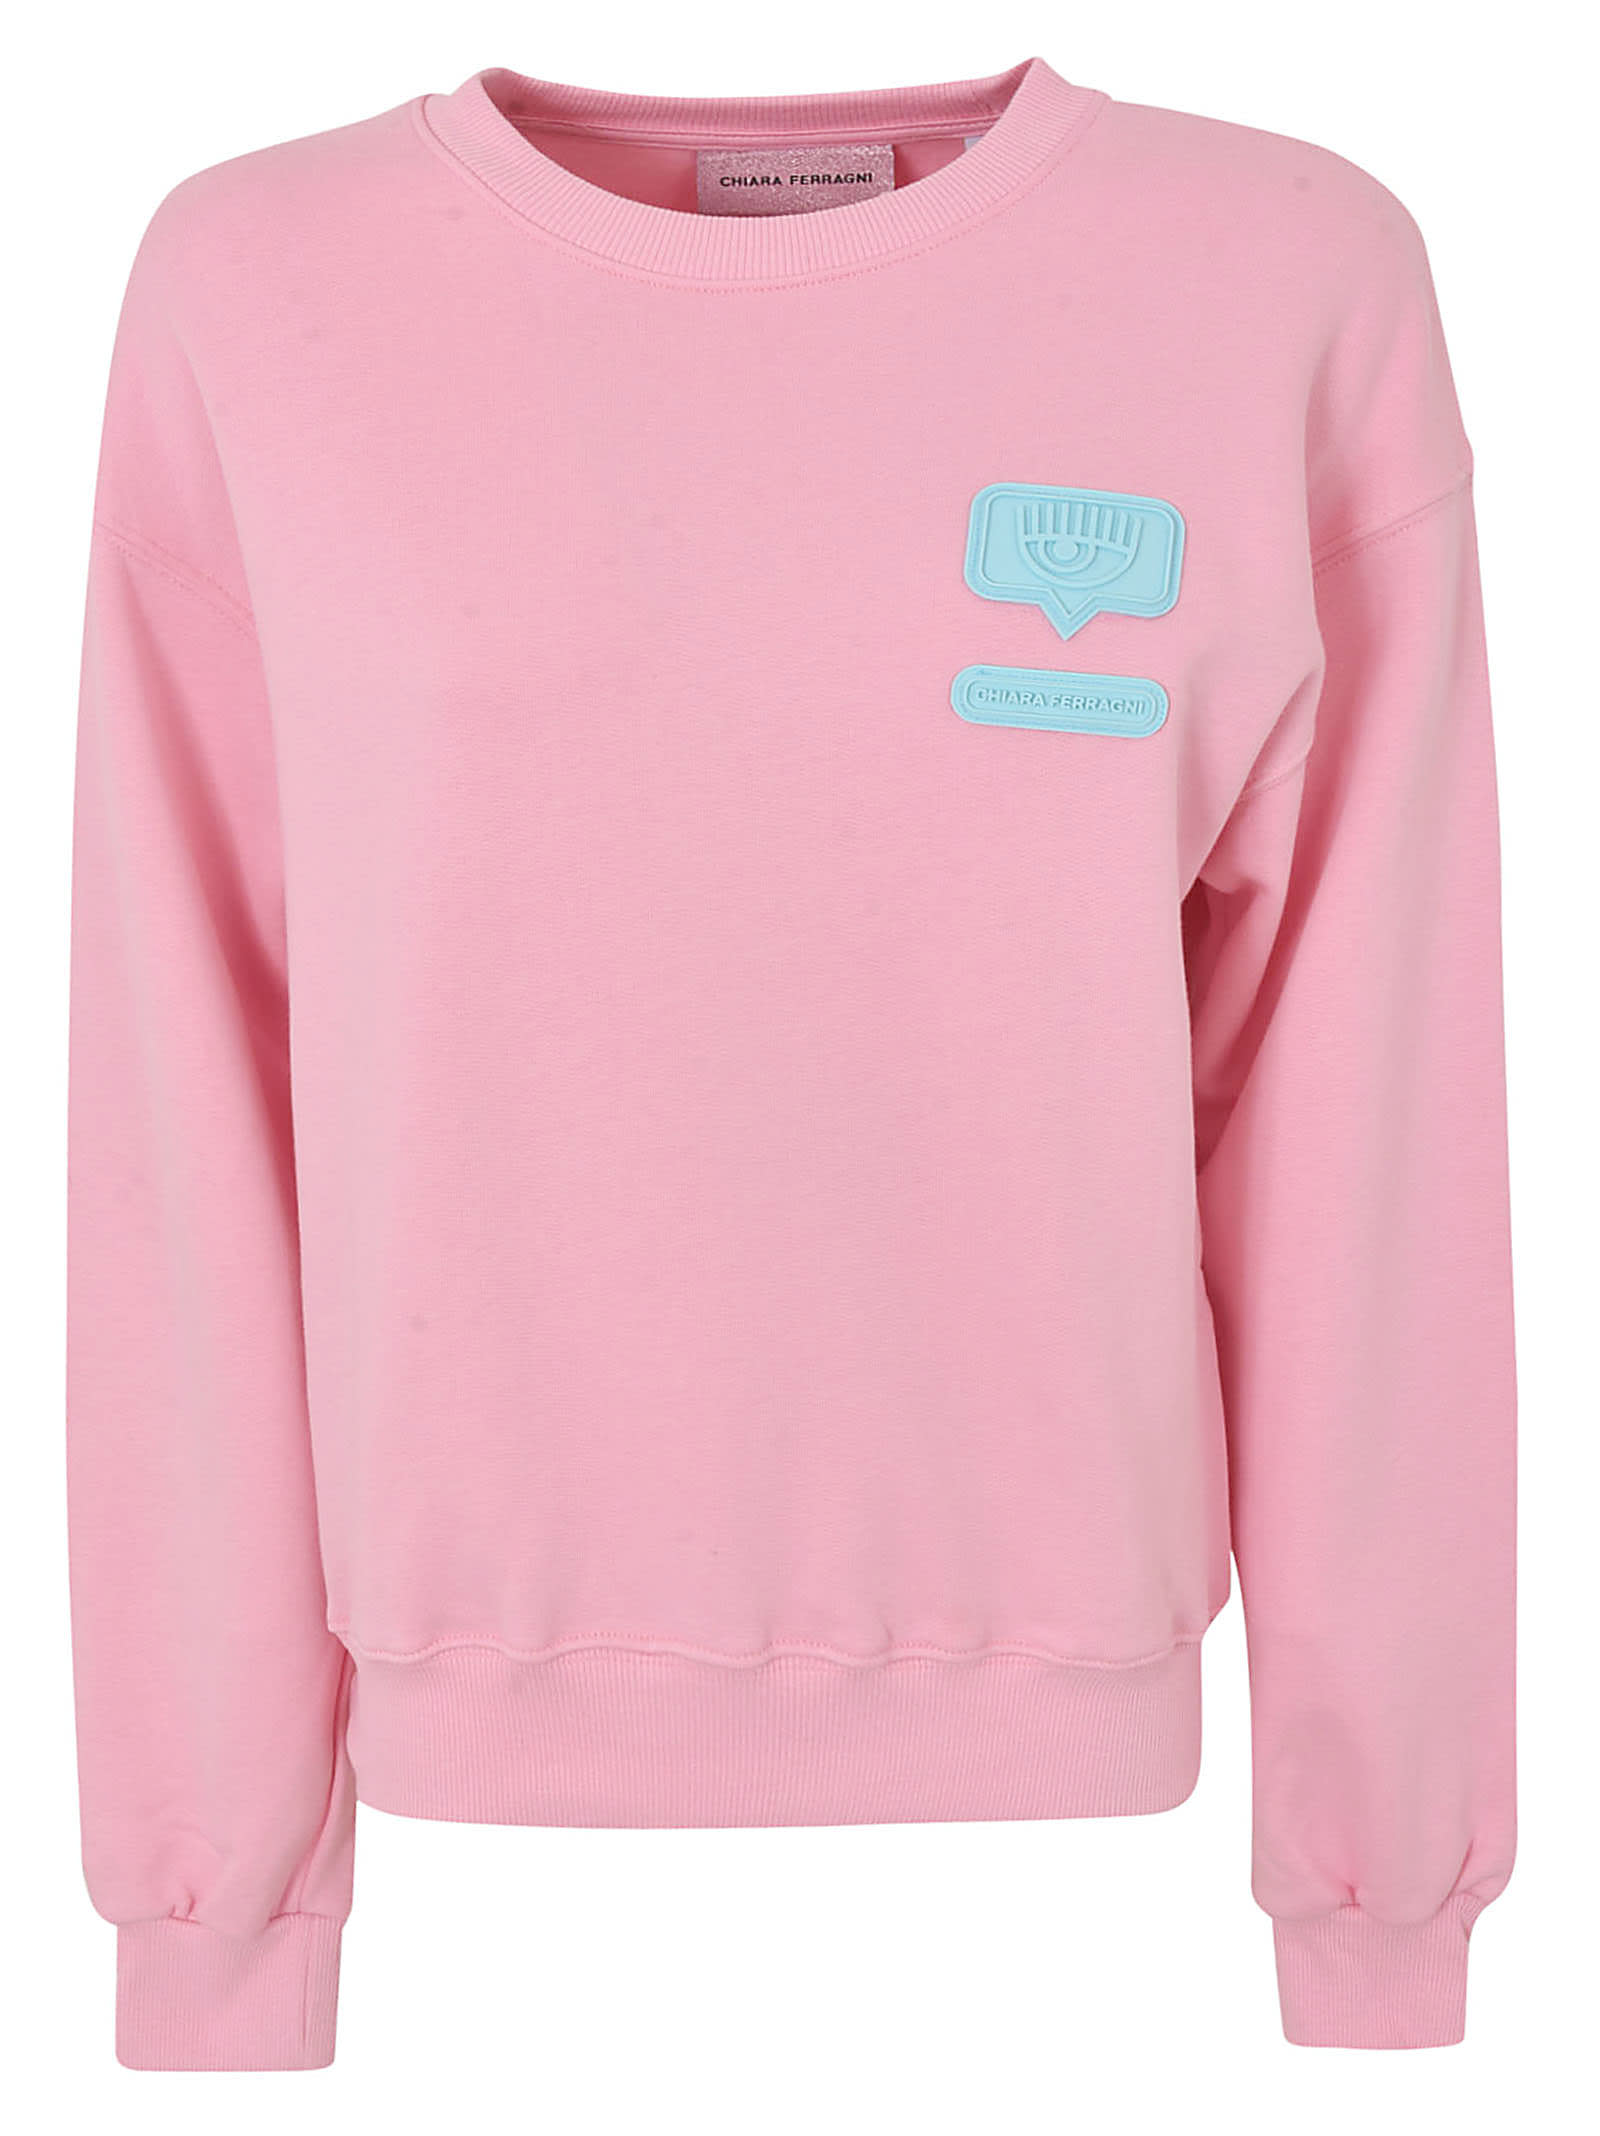 Chiara Ferragni Logo Patched Sweatshirt